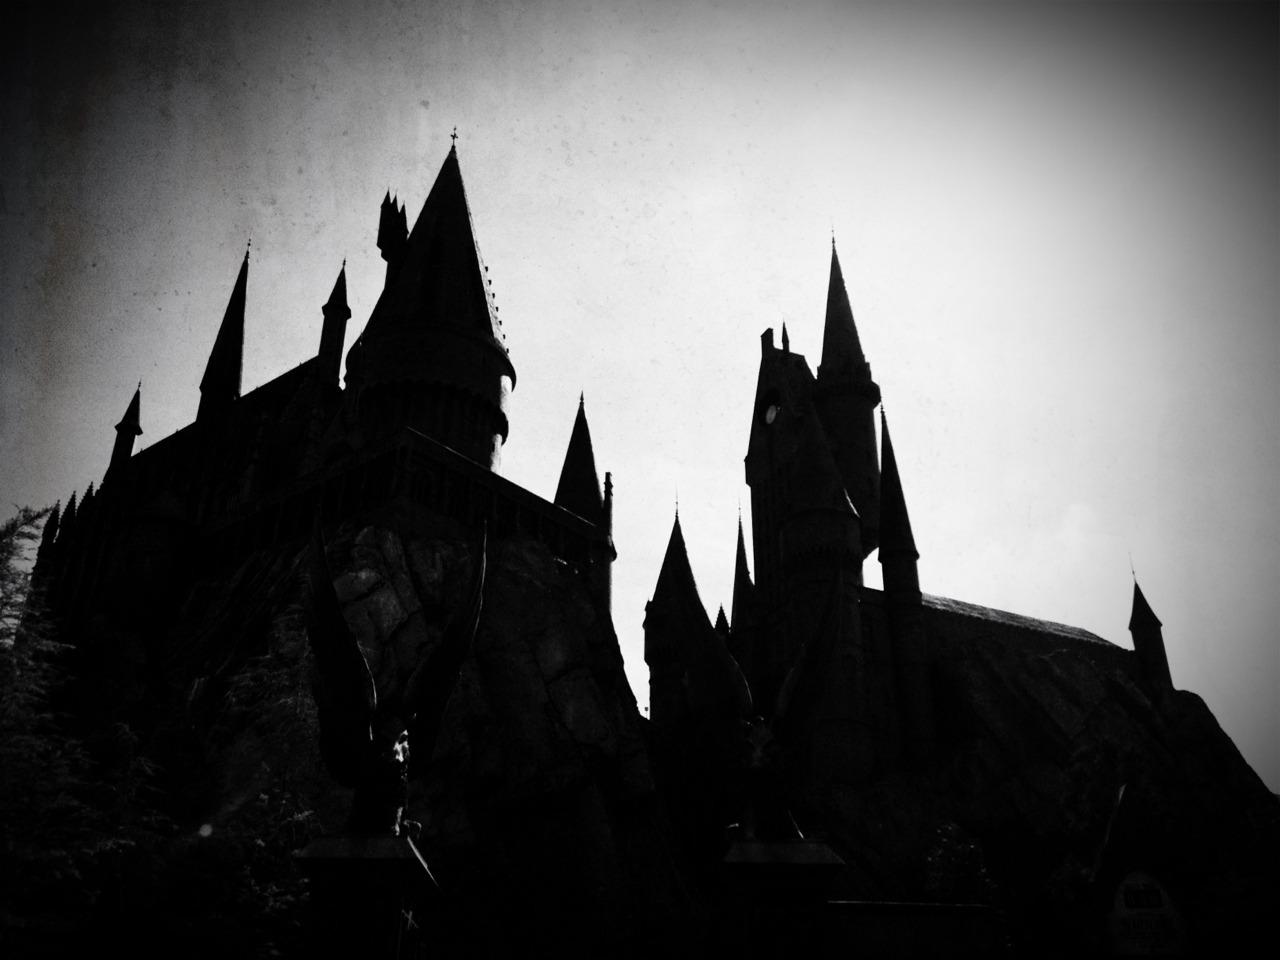 Hogwarts Castle silhouette.